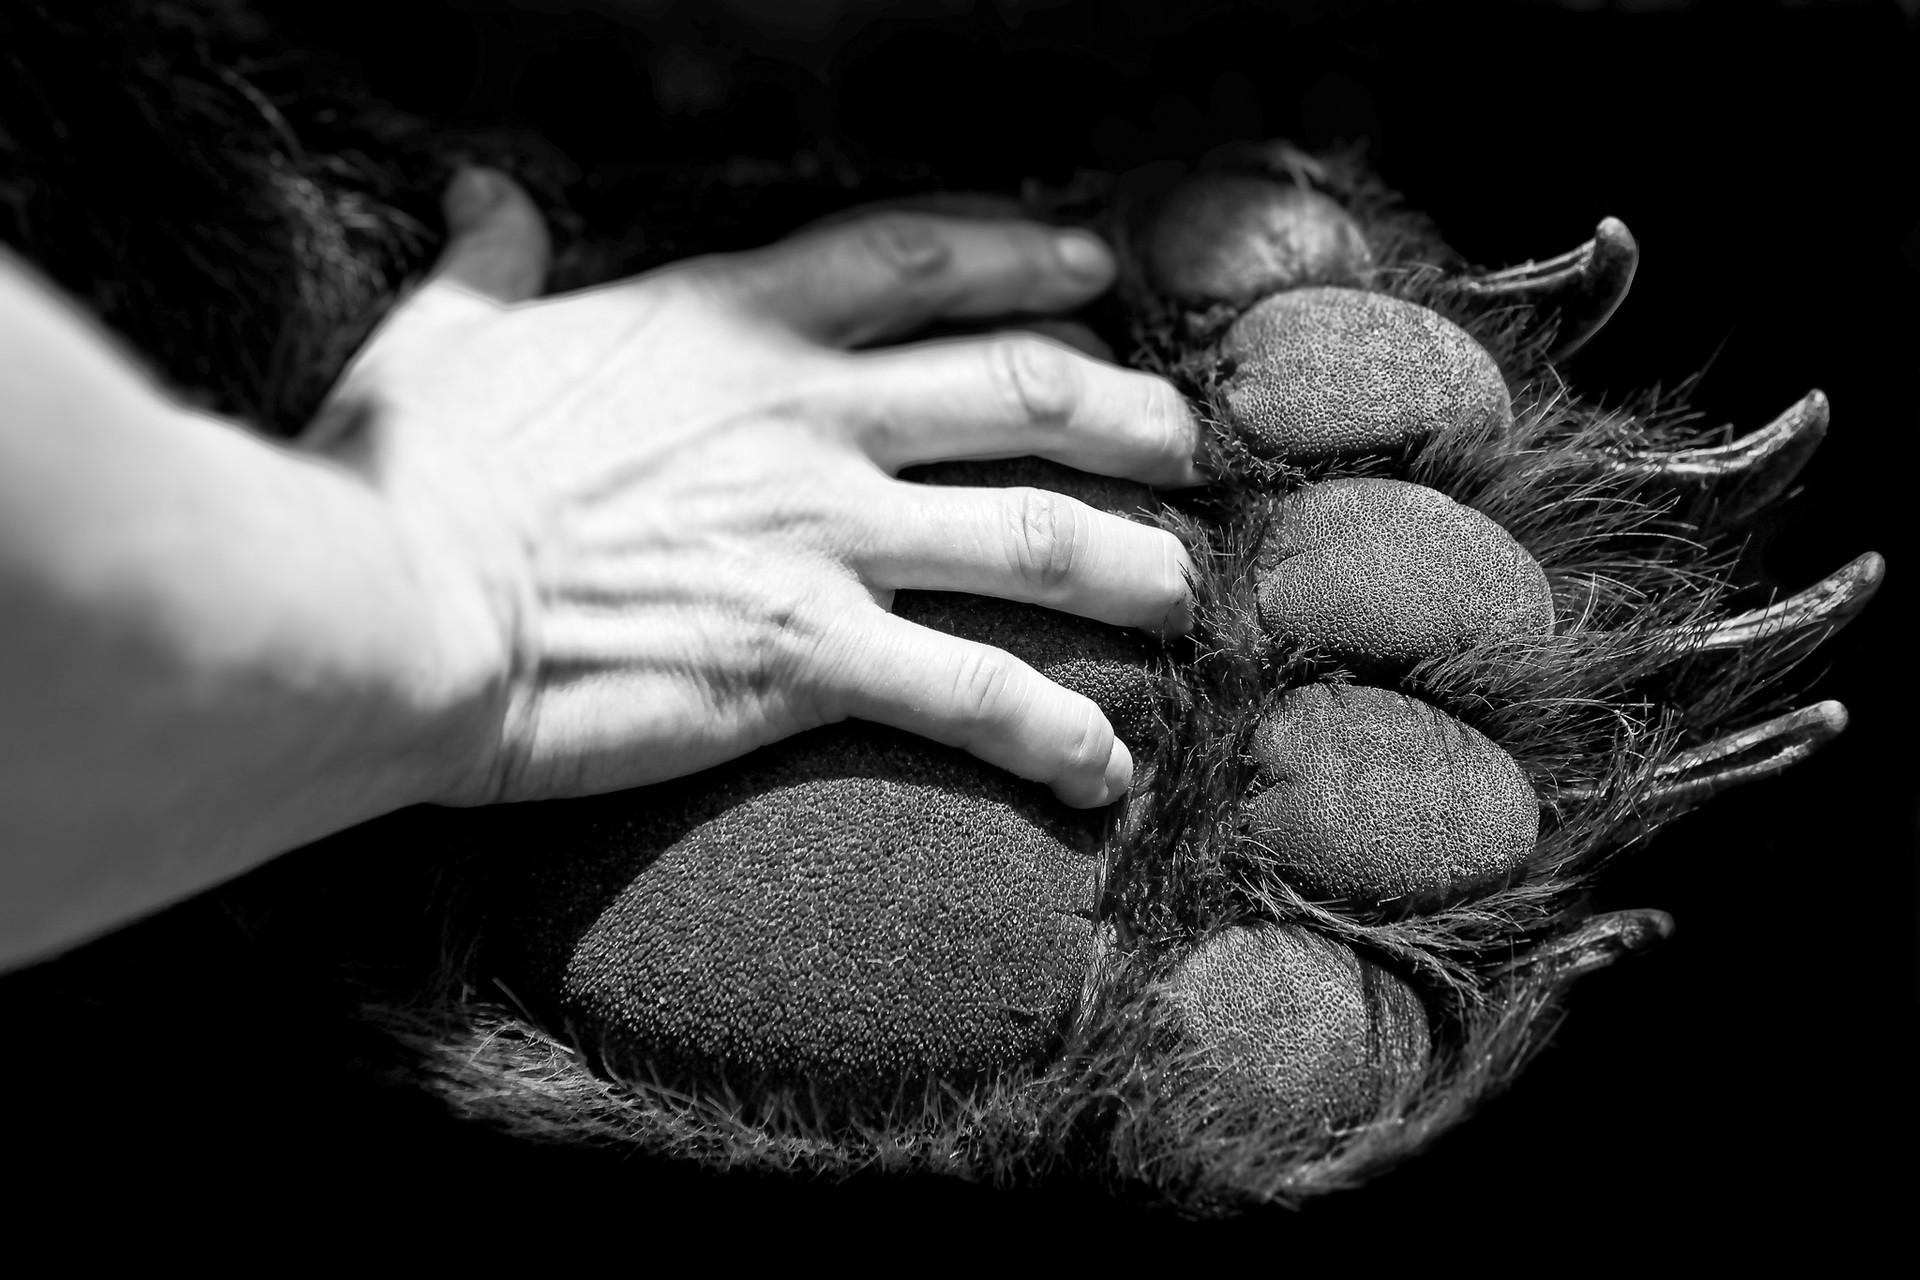 Bear Paw and human hand